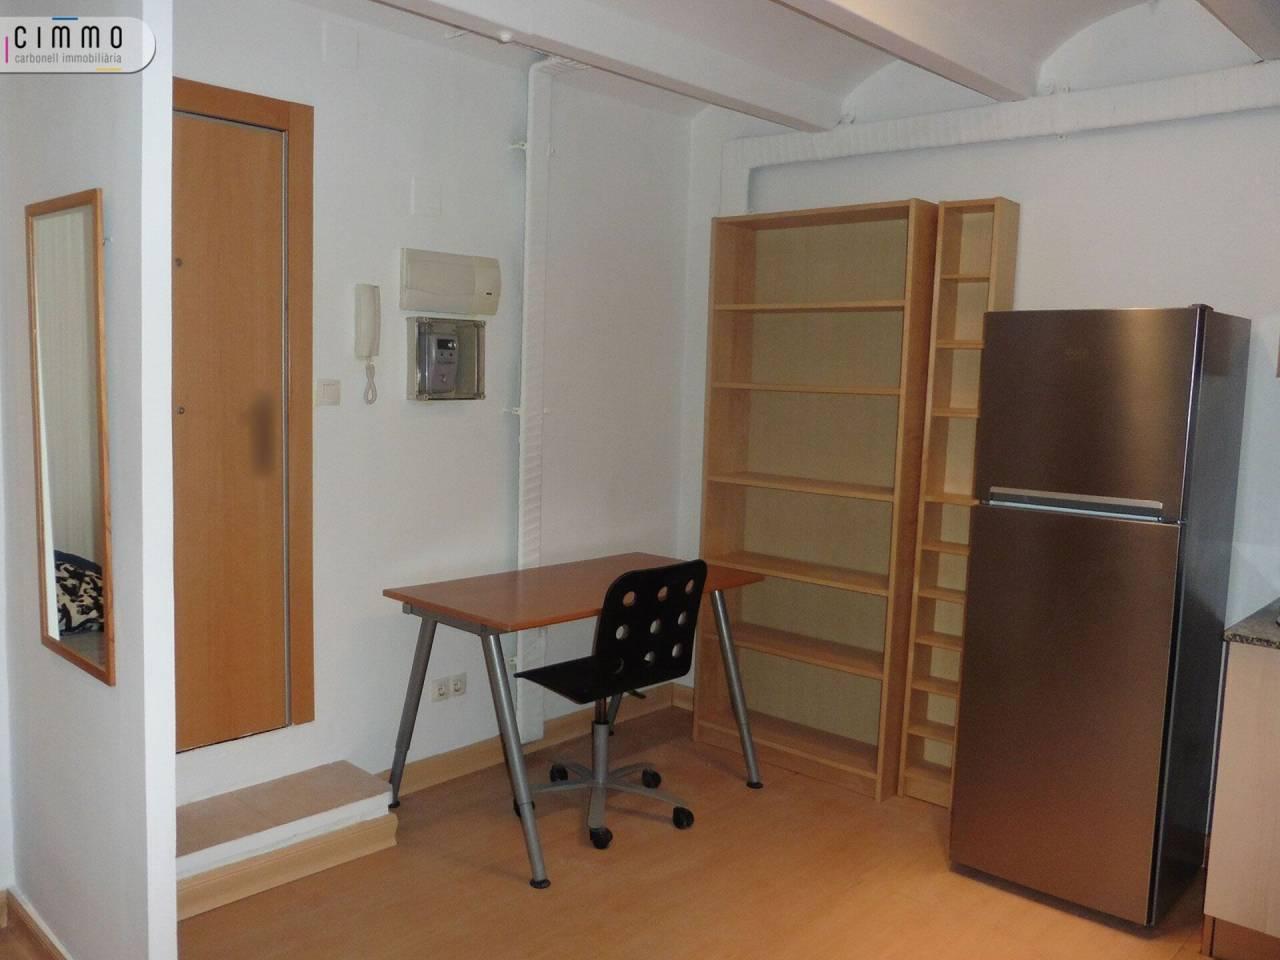 Estudio en alquiler La Vila de Gràcia (Barcelona Capital)